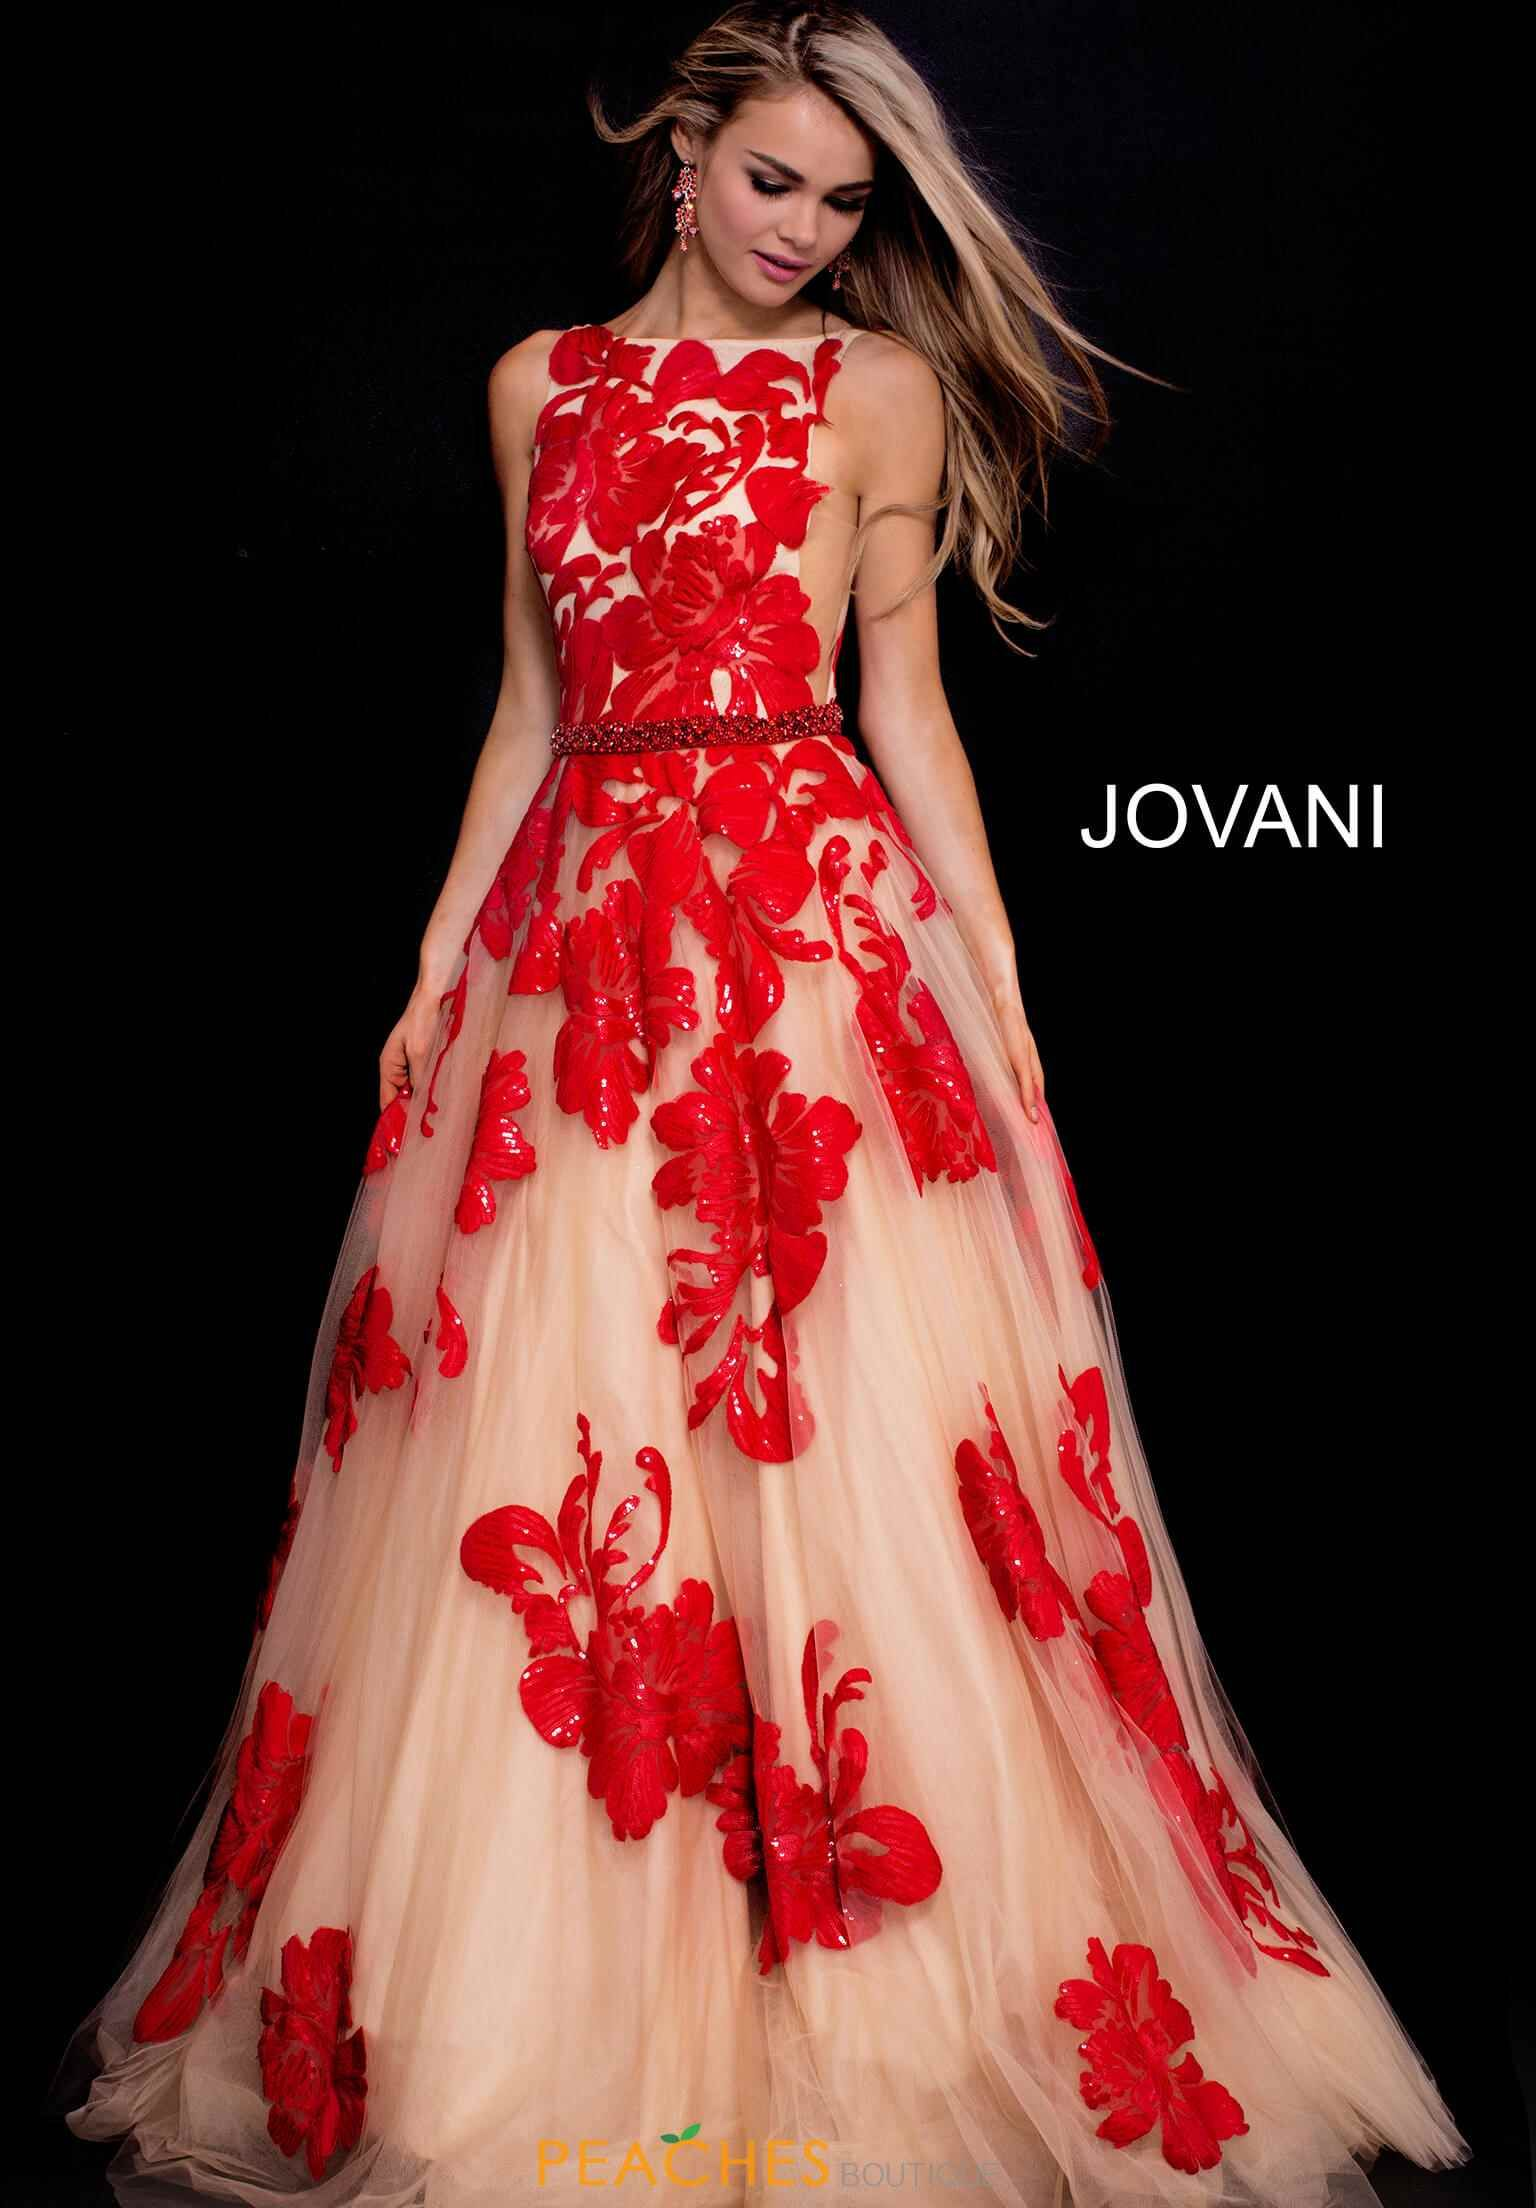 Jovani Prom Dresses Peaches Boutique Prom Dresses Jovani Jovani Dresses Red Ball Gowns [ 2208 x 1536 Pixel ]